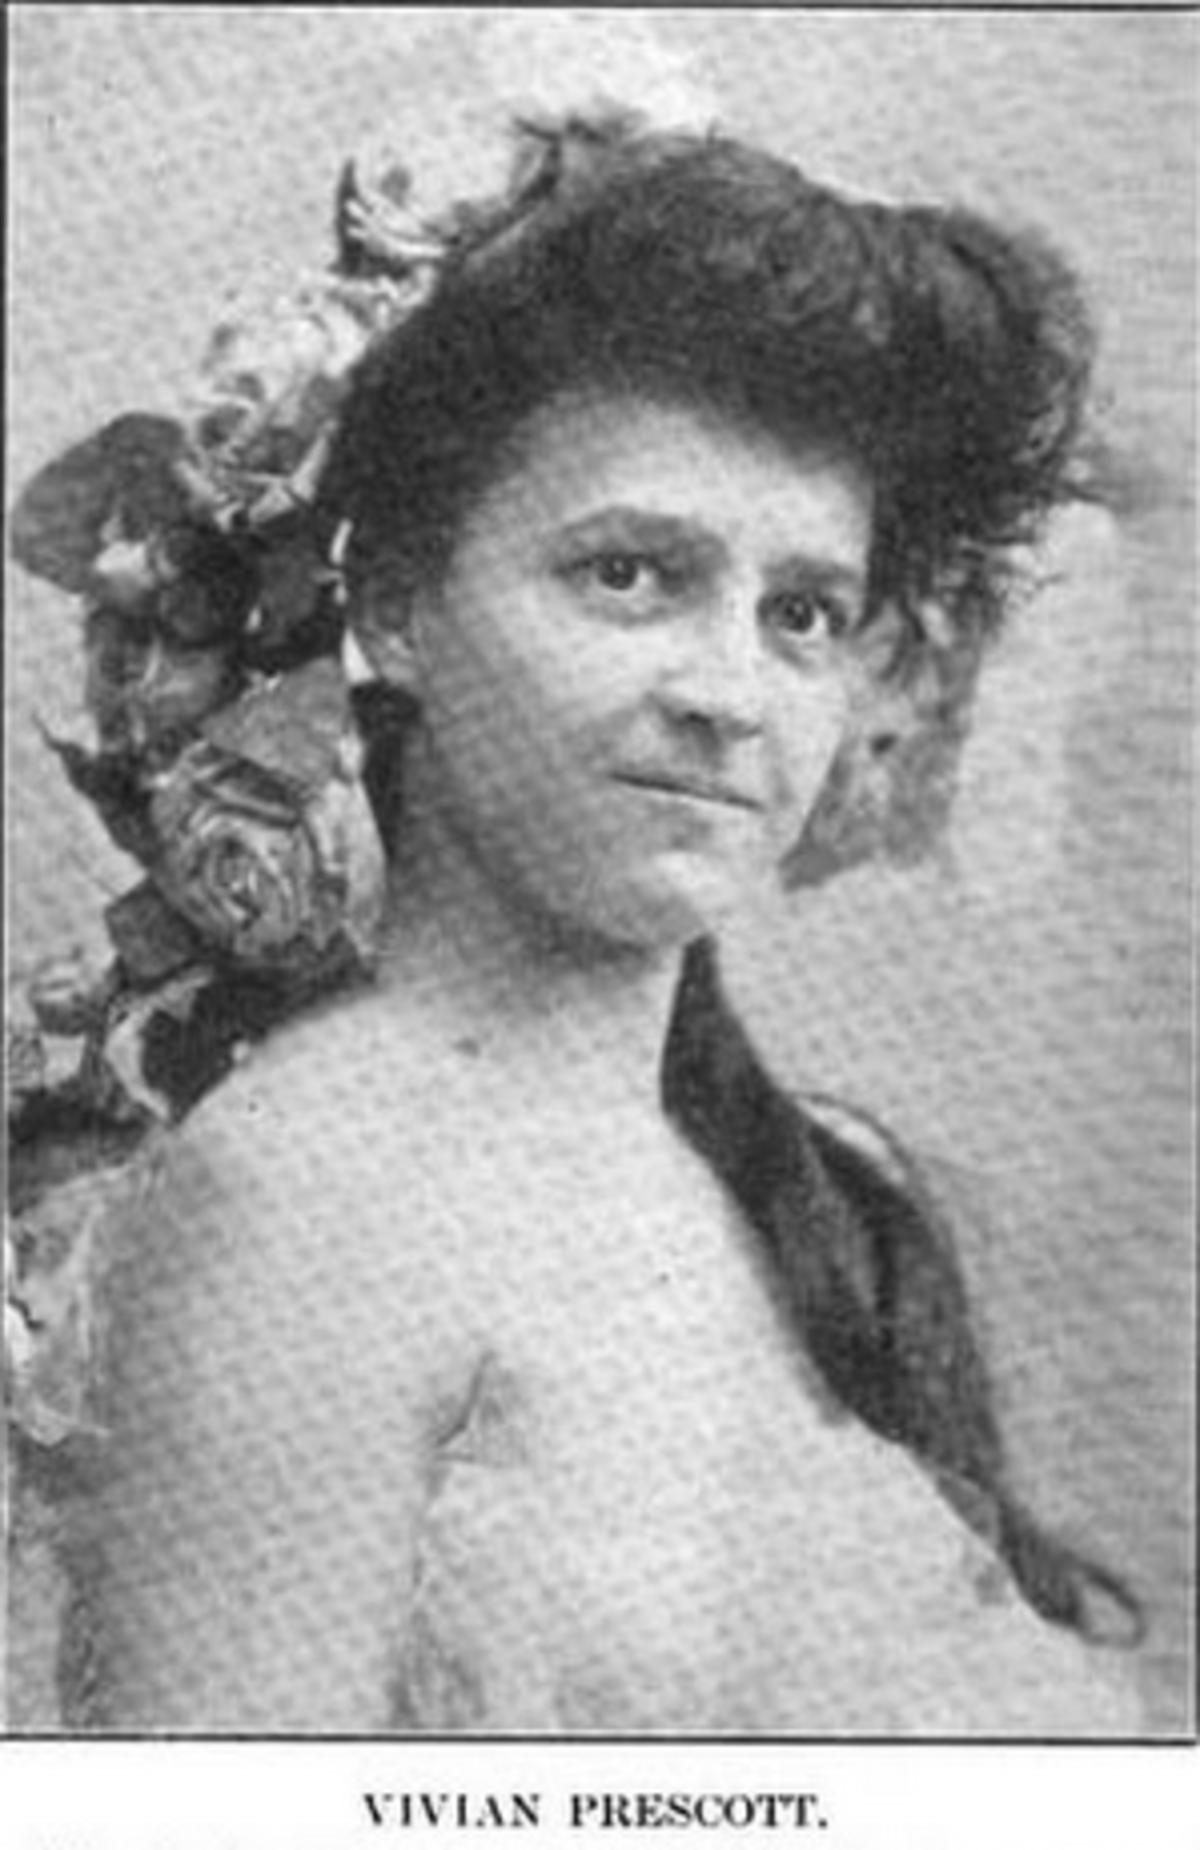 Vivian Prescott